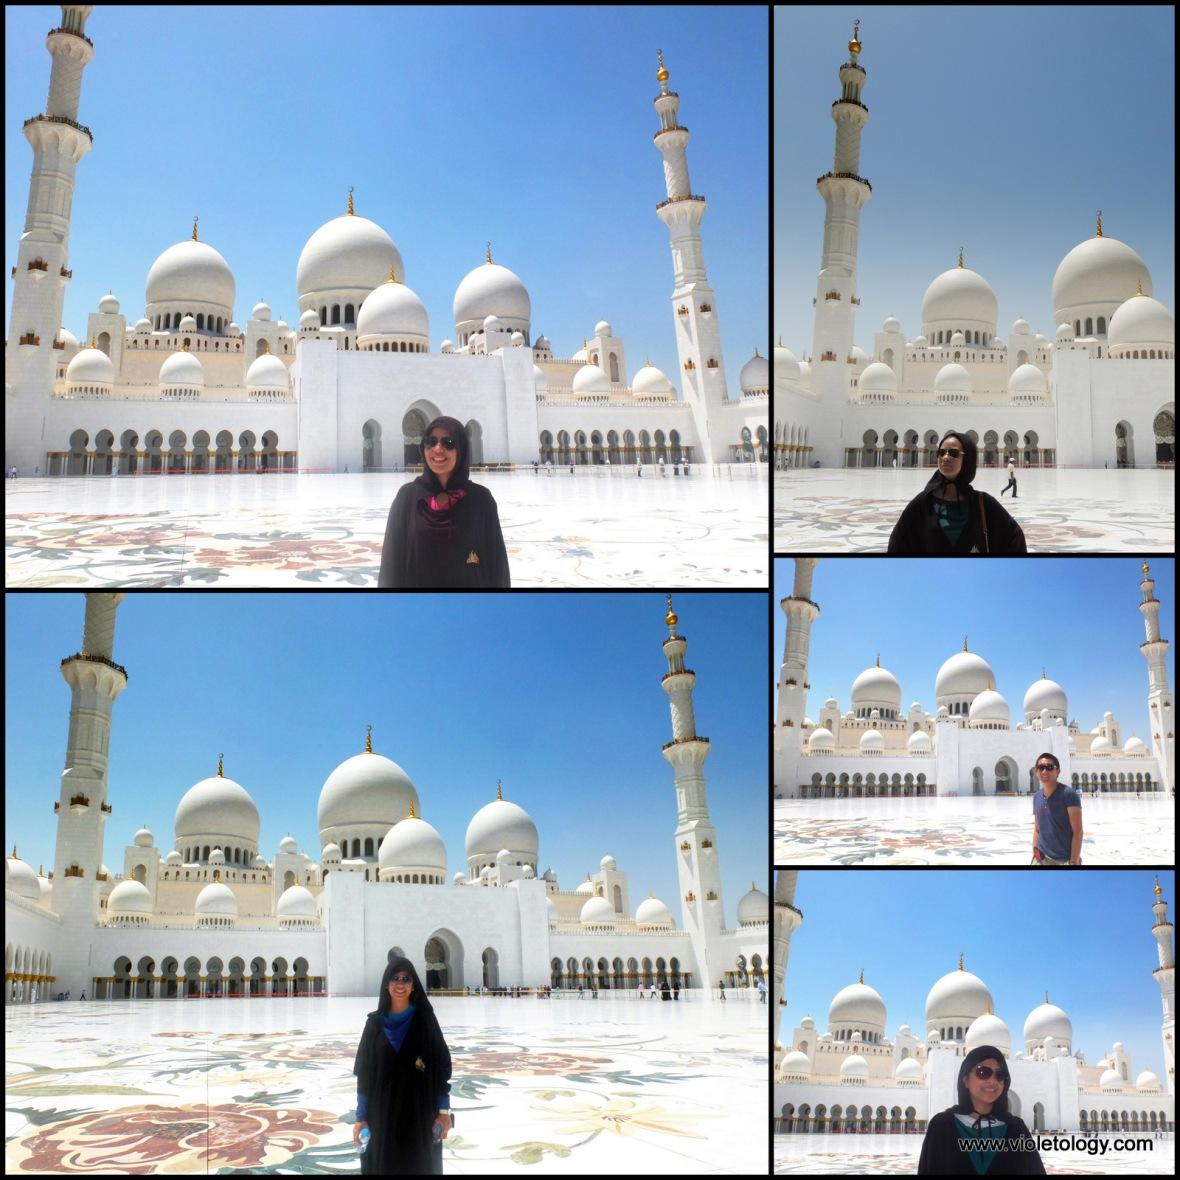 Abu Dhabi Mosque (13)